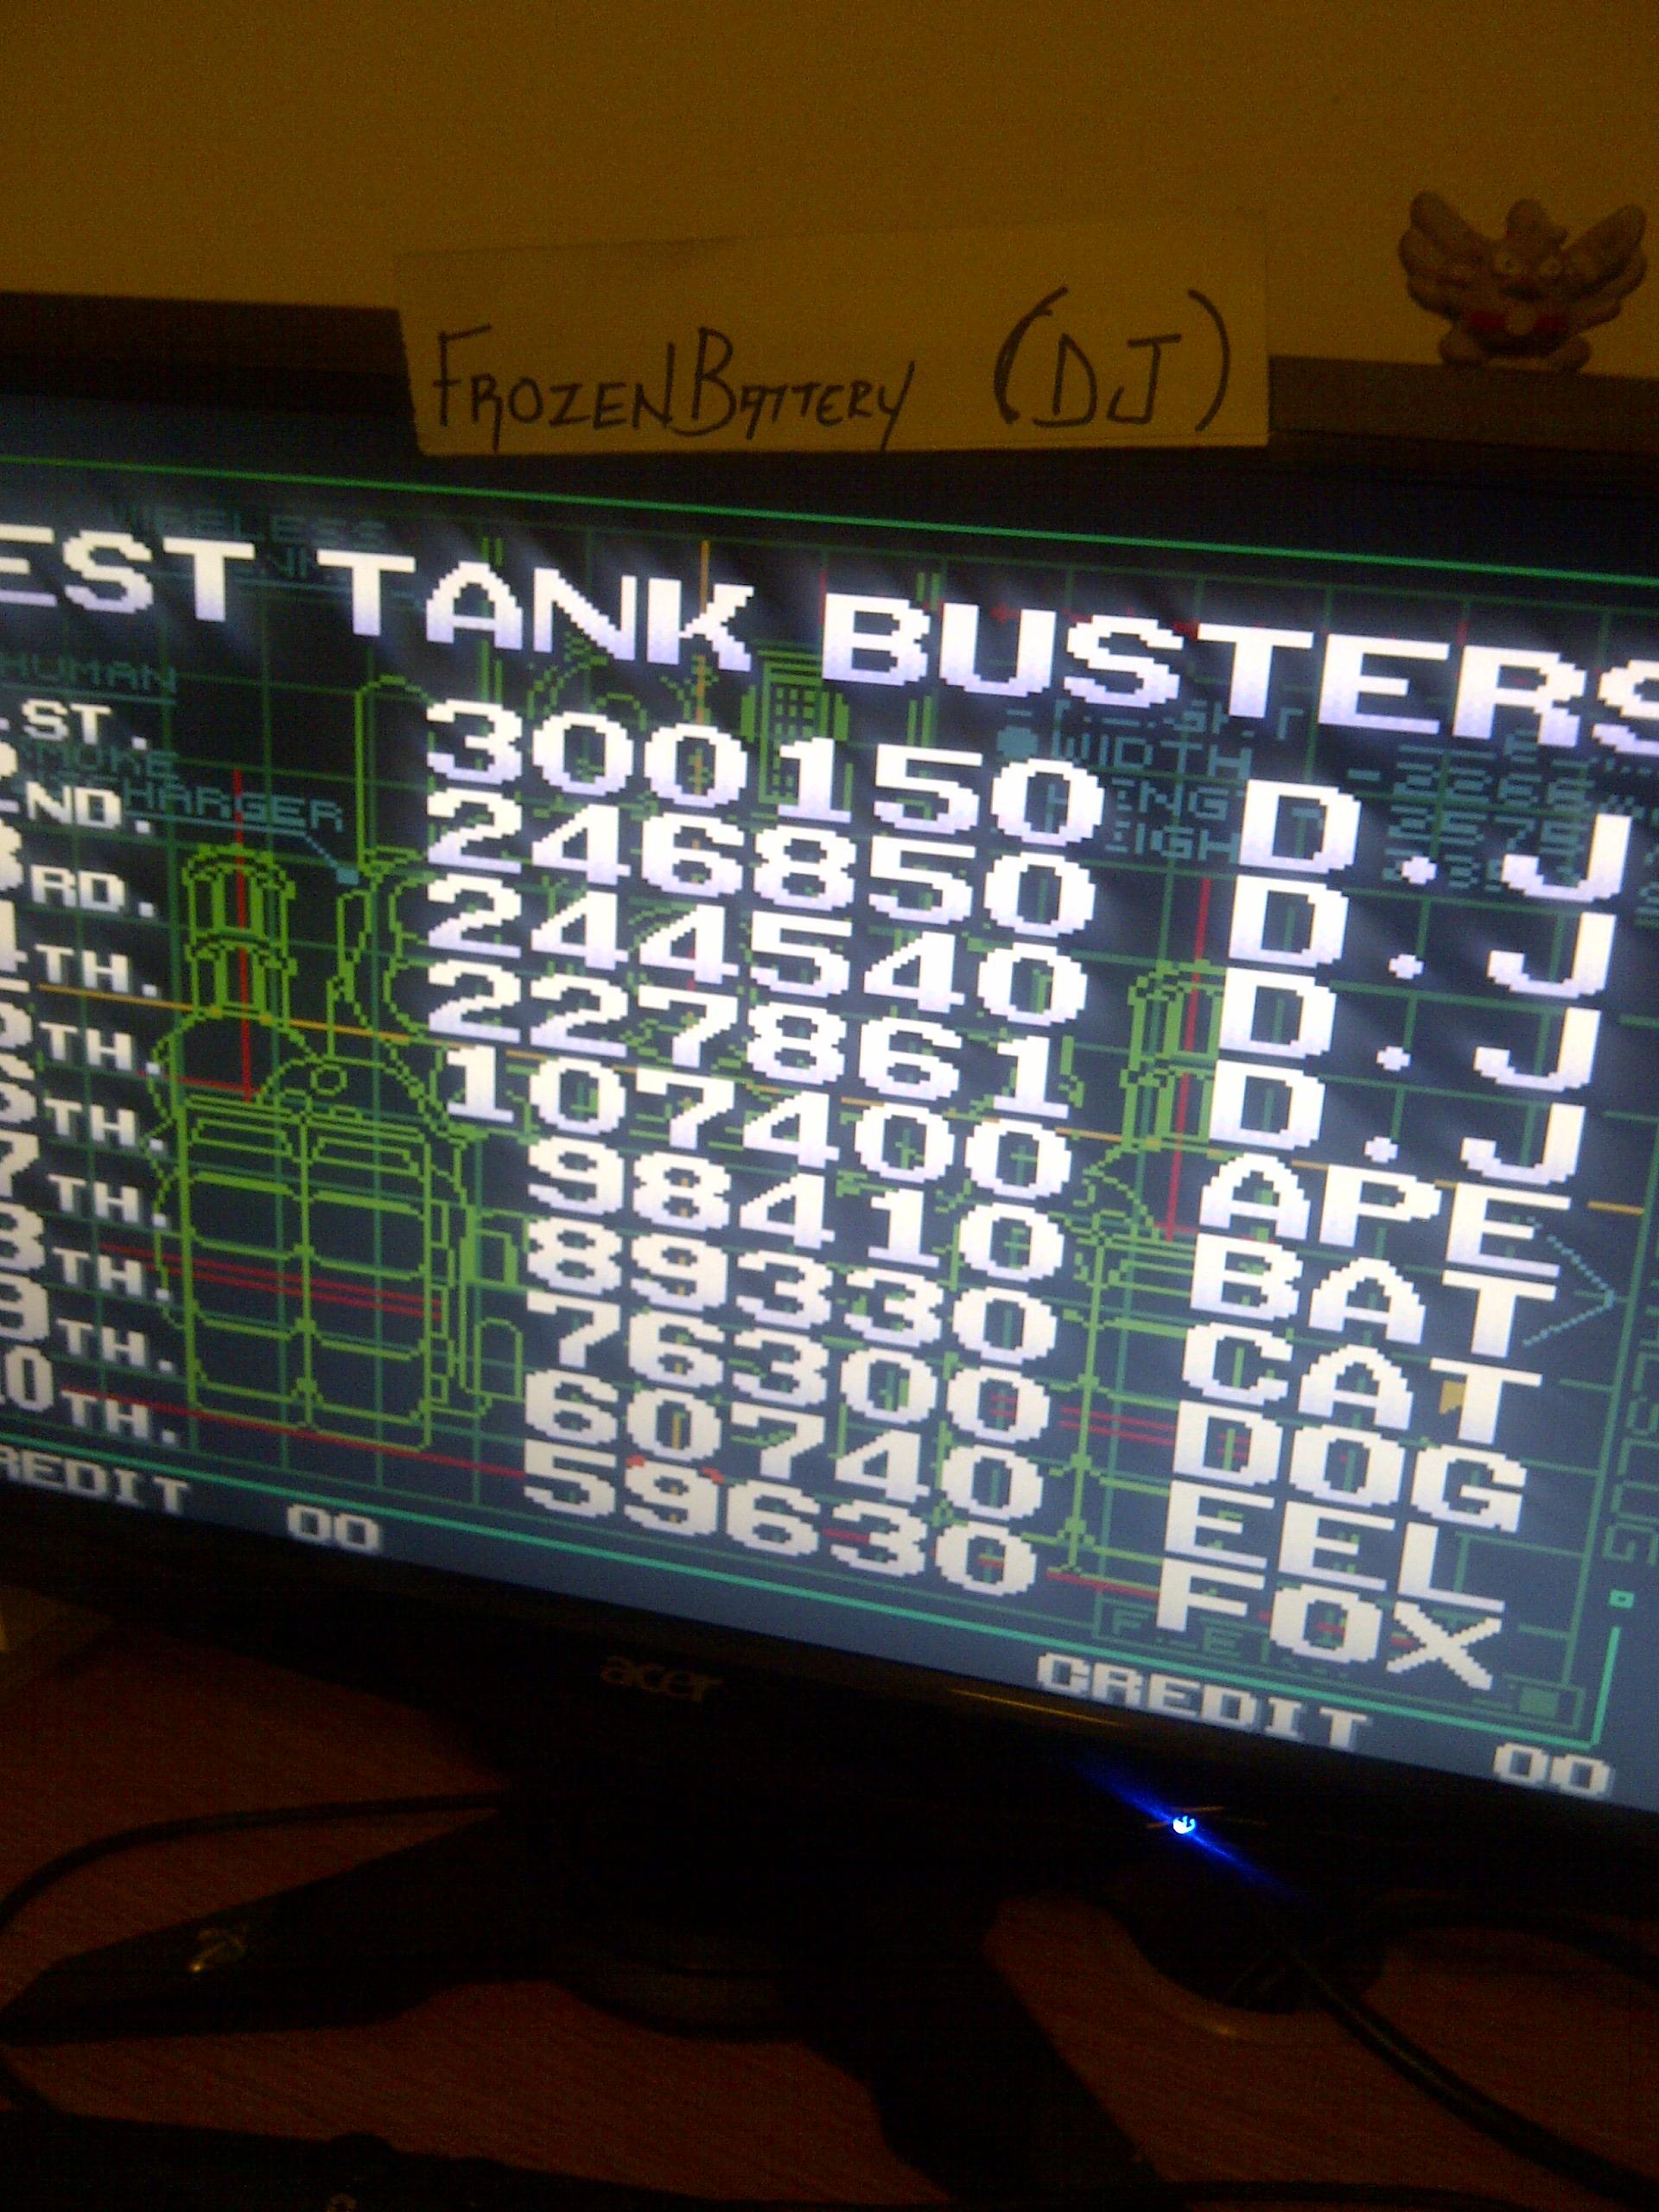 Metal Slug 4 300,150 points